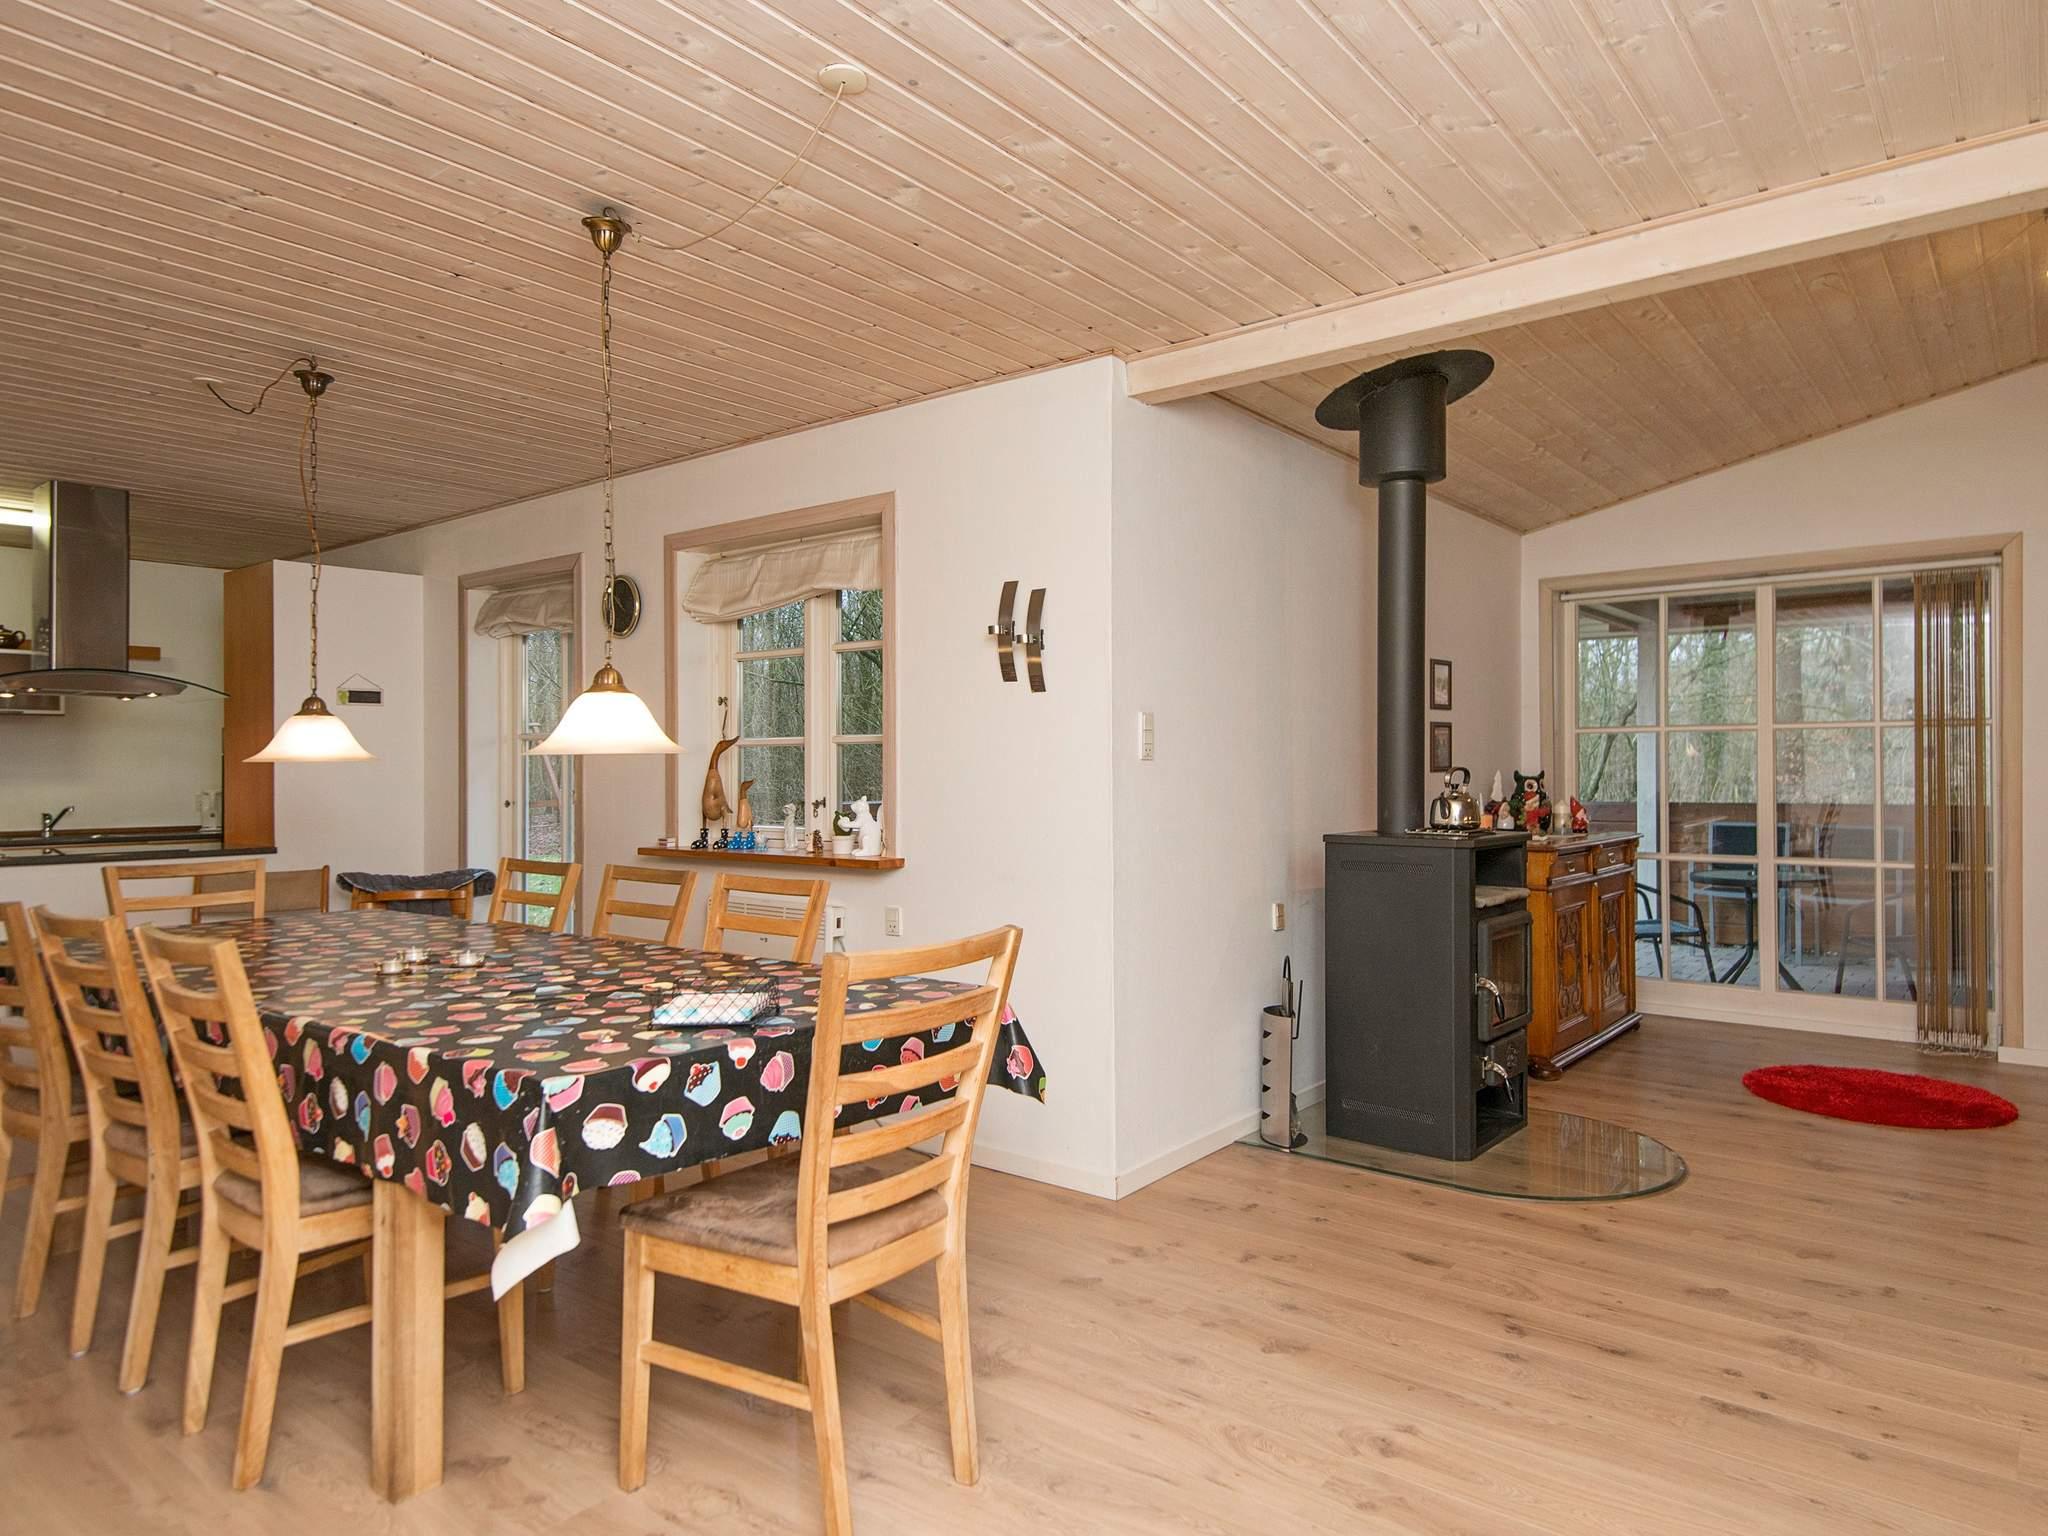 Ferienhaus Arrild (730074), Arrild, , Südwestjütland, Dänemark, Bild 4